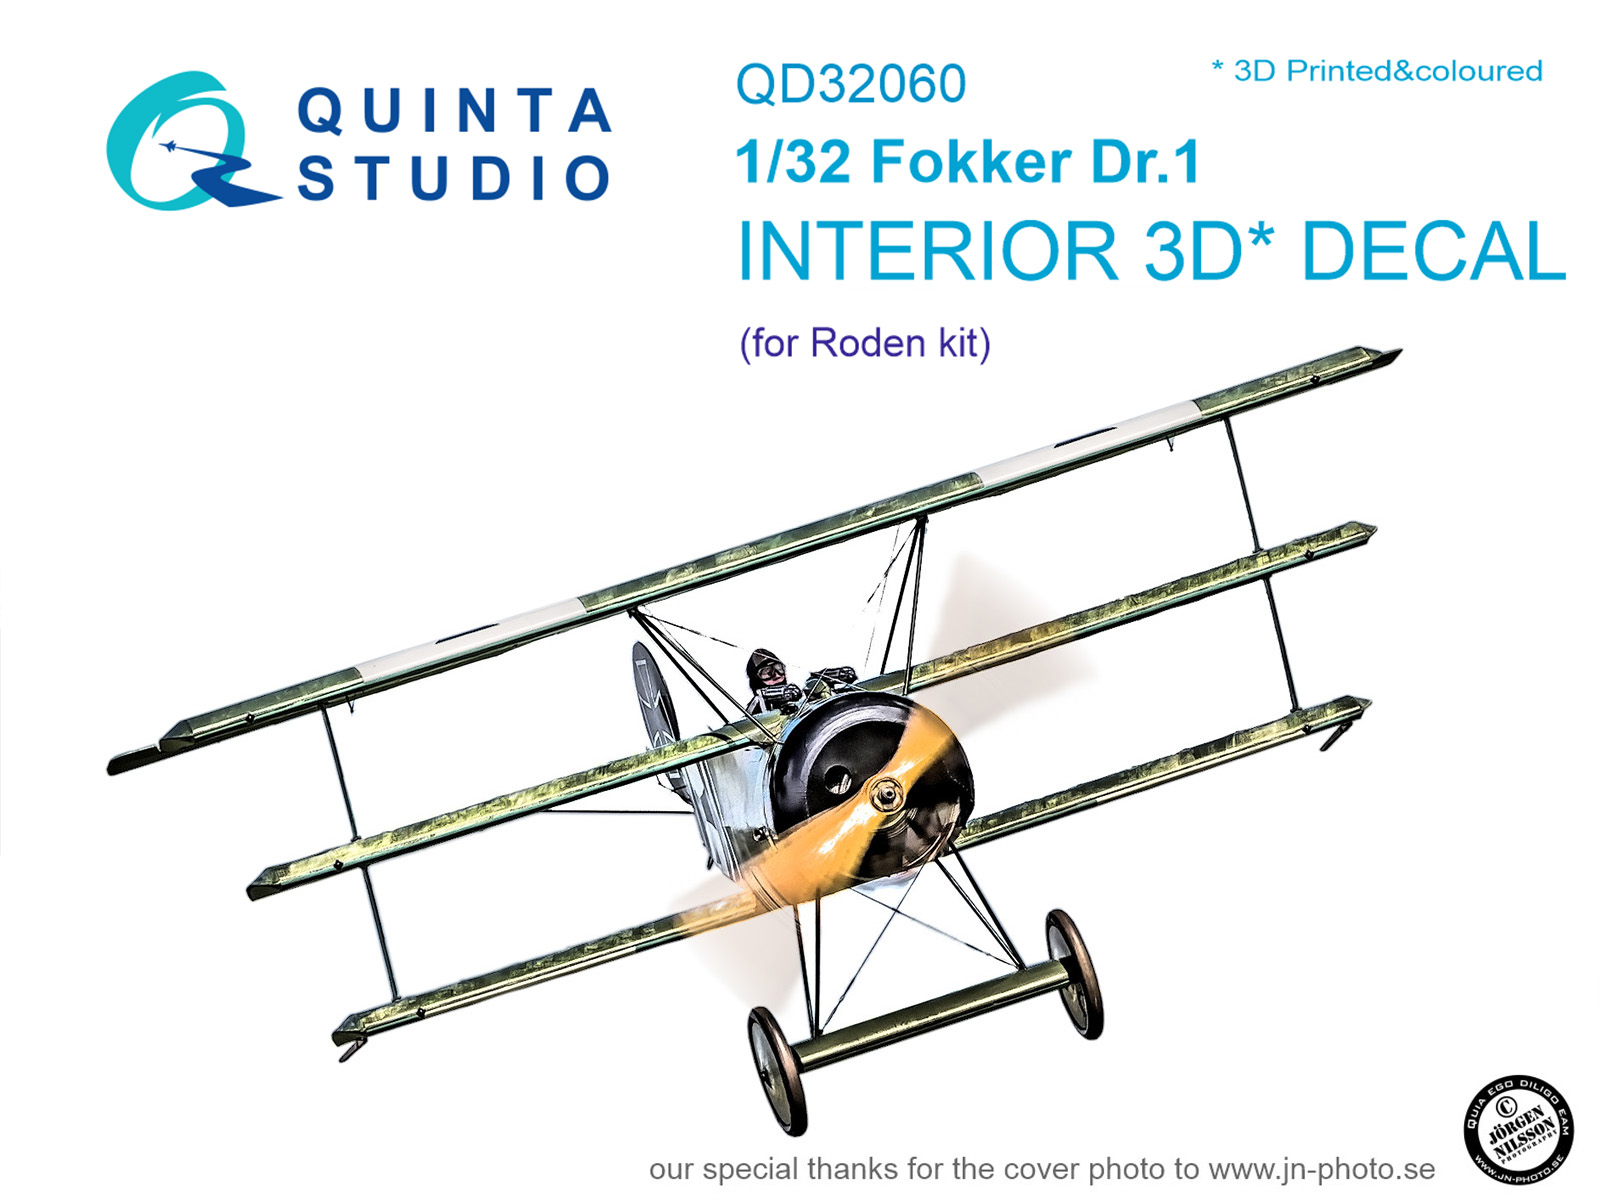 QD32060